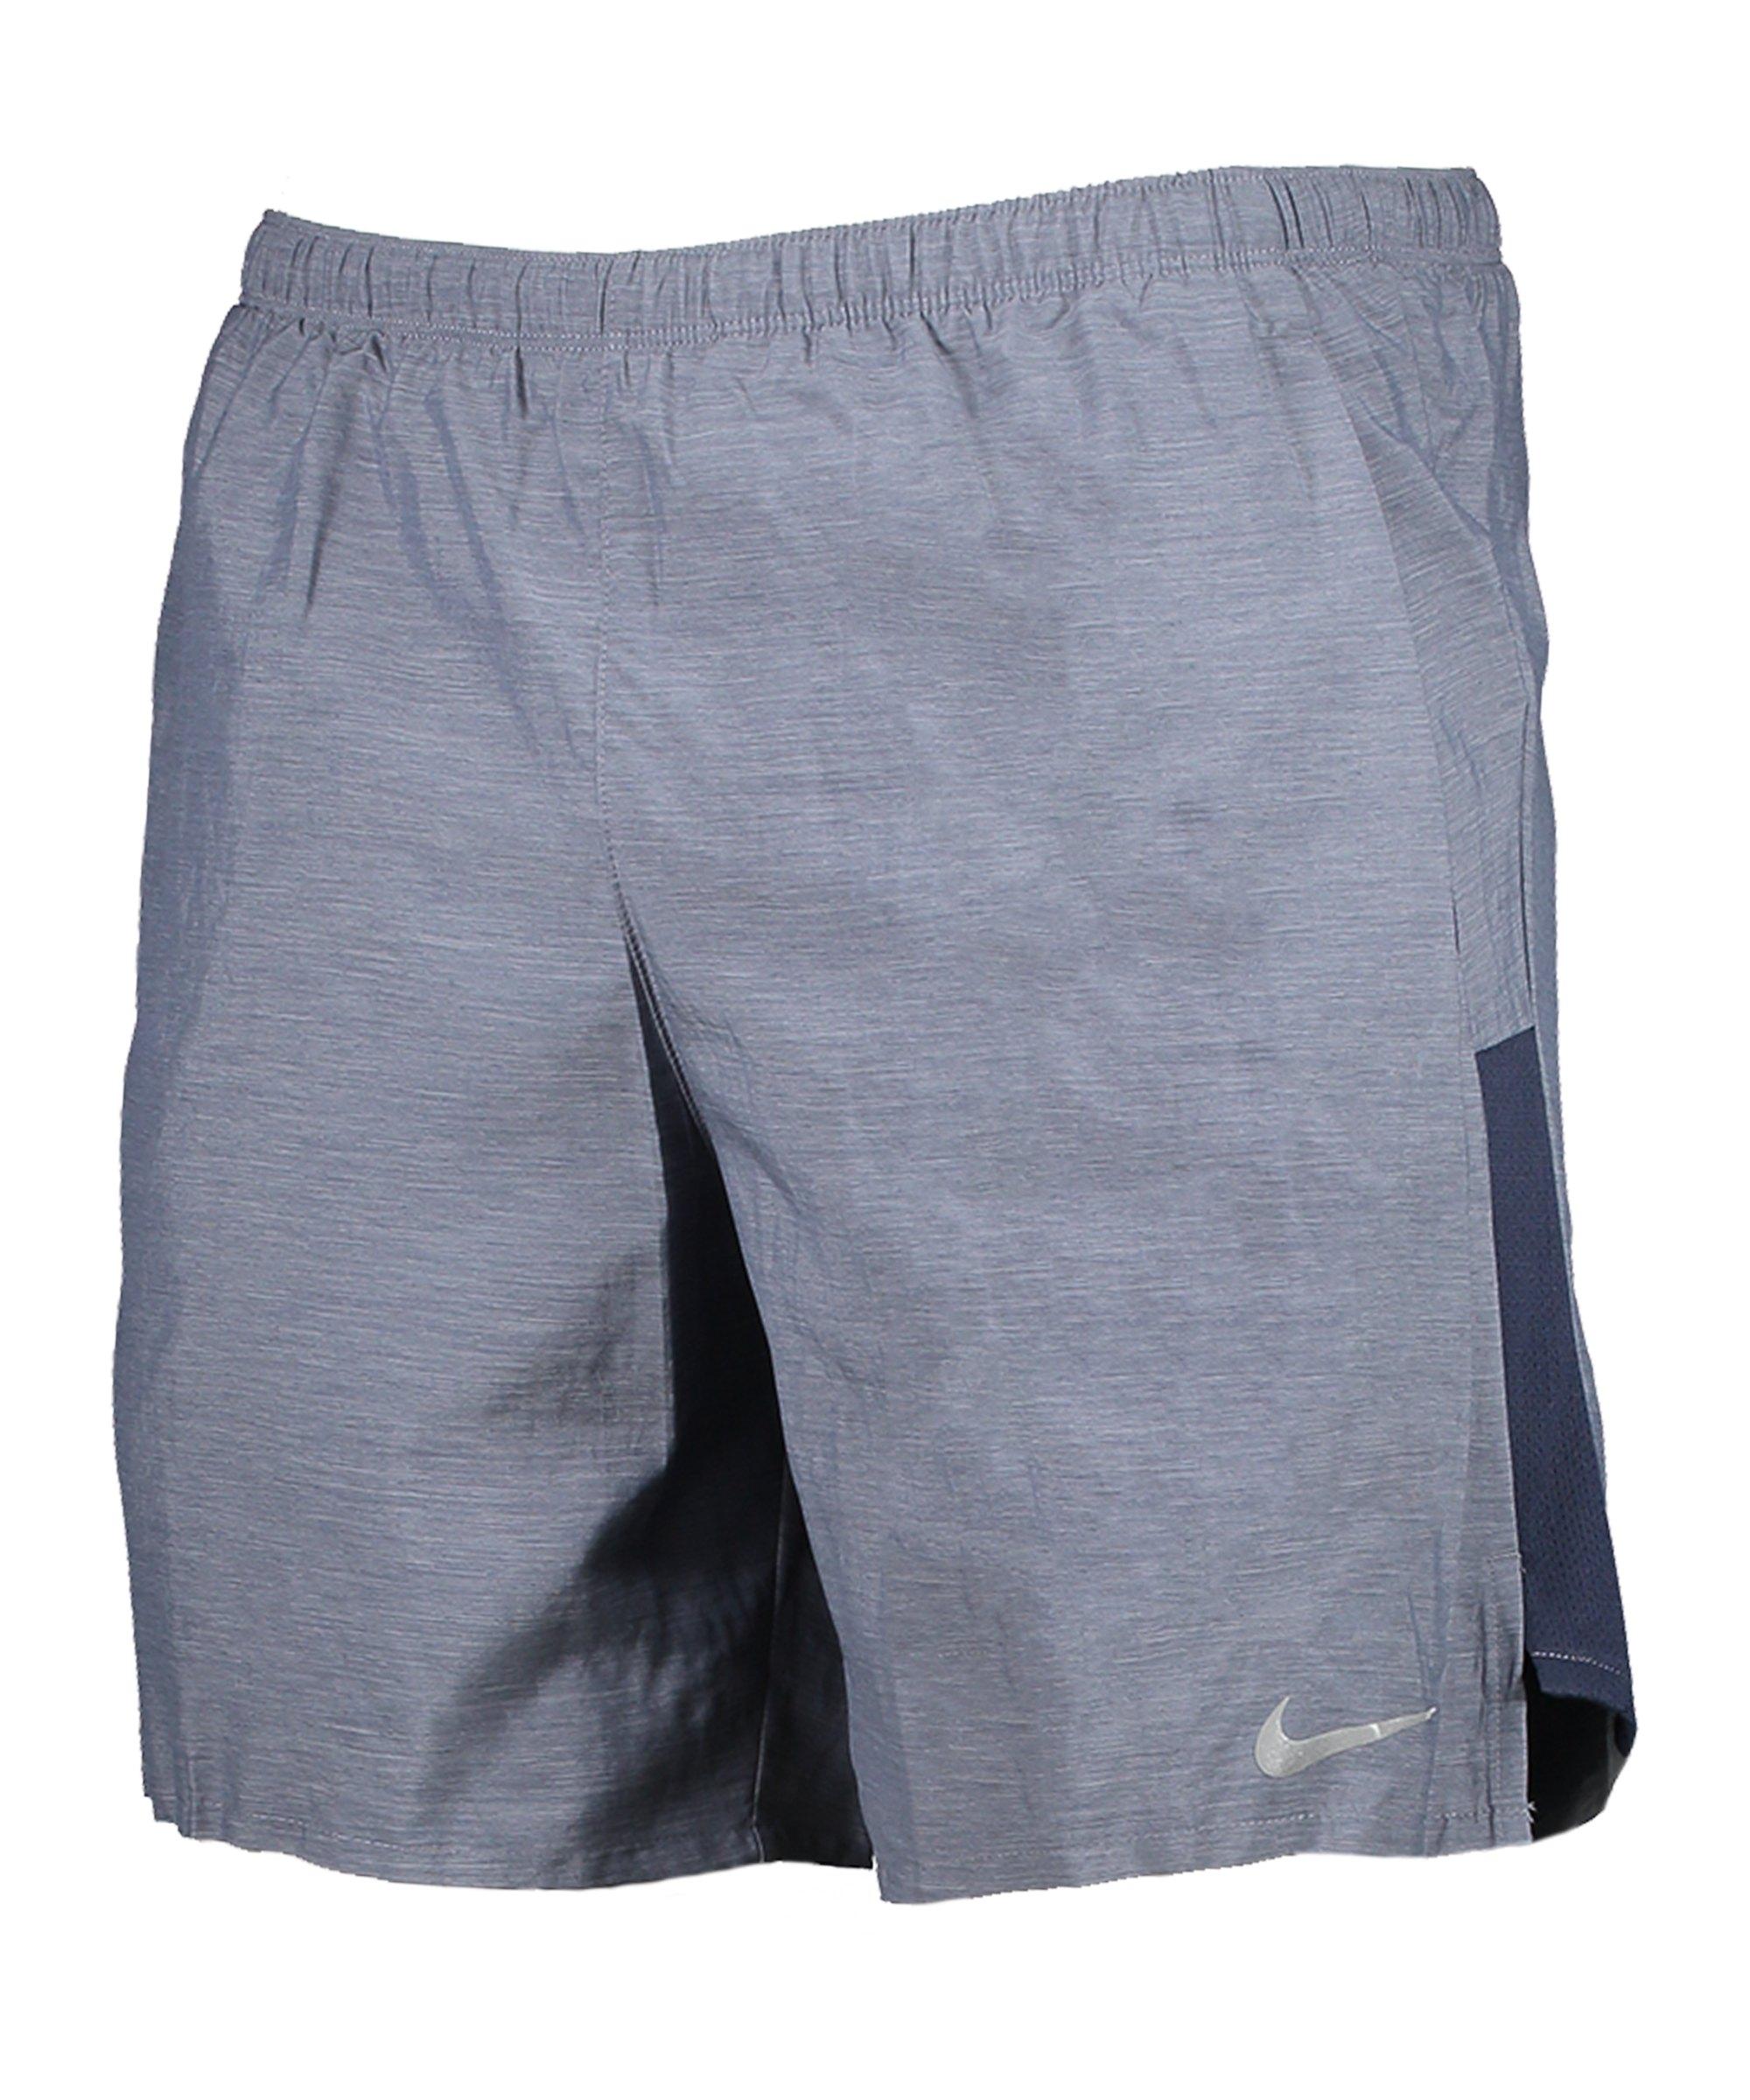 Nike Challenger 7 2in1 Short Running Blau F451 - blau